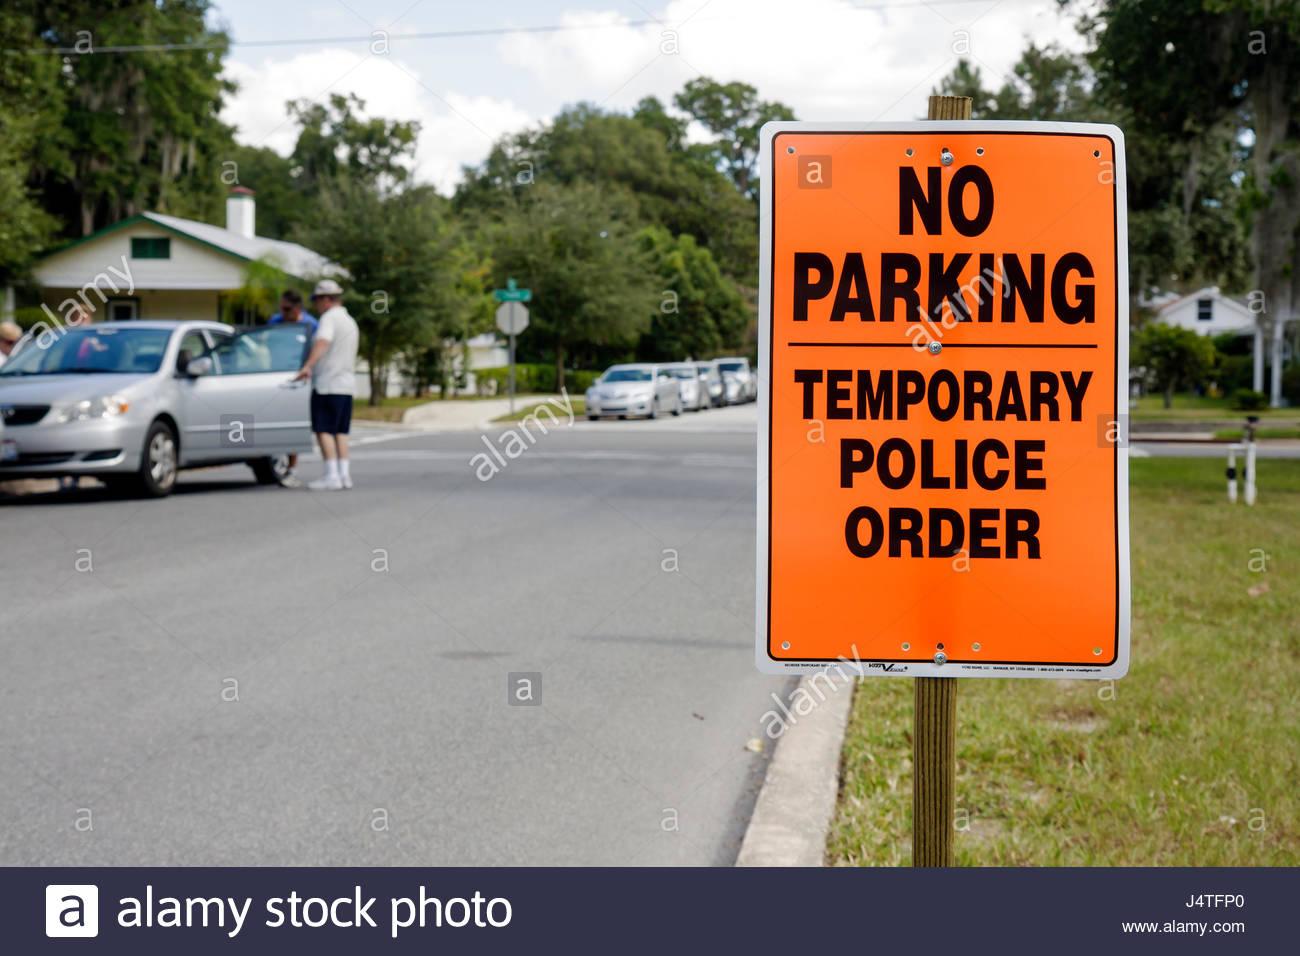 Mount Dora Florida Mt. Annual Craft Fair temporary sign police order warning no parking street parked car man - Stock Image